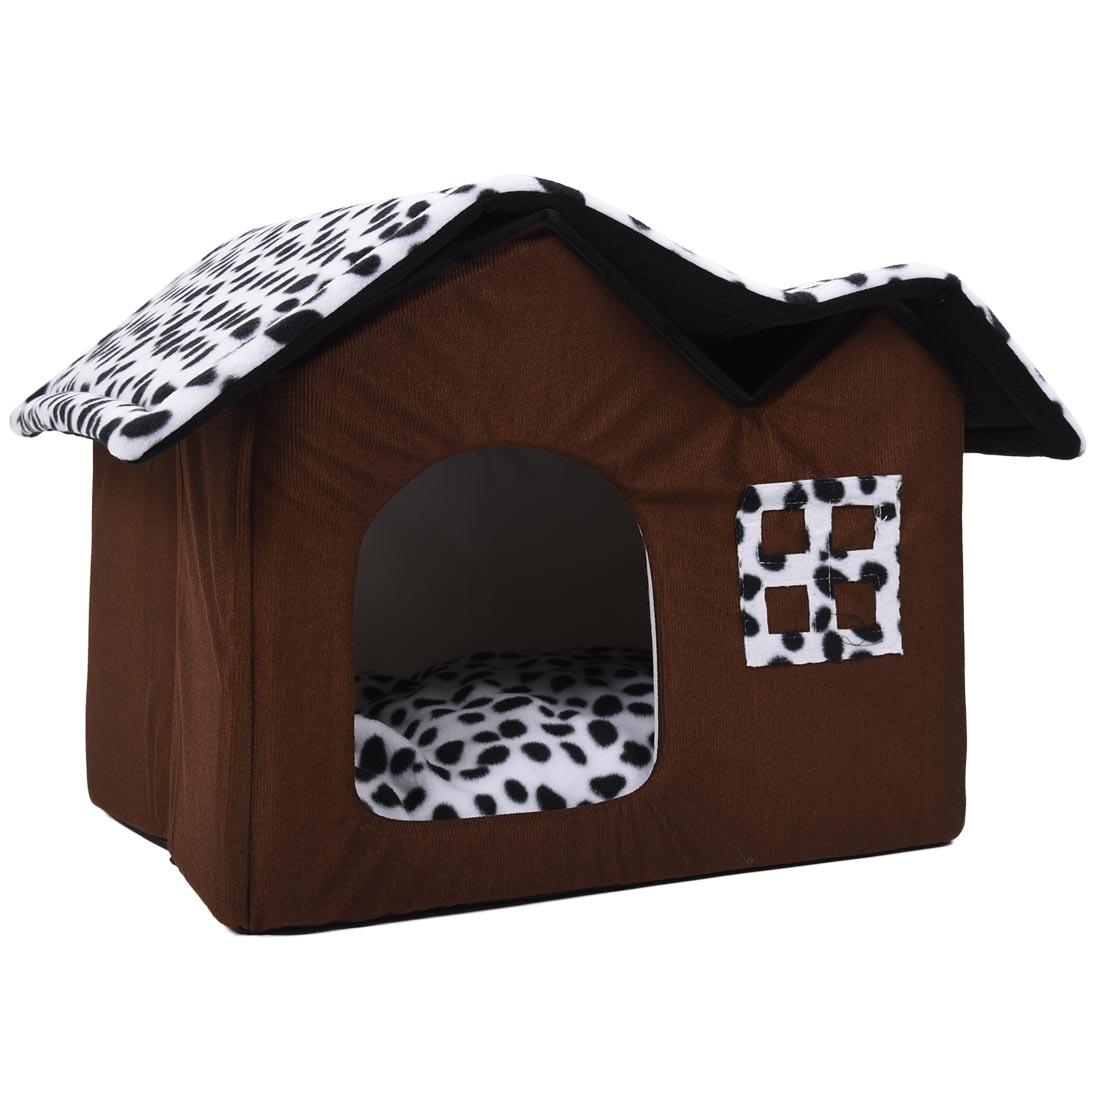 Pet House Luxury High-End Double Dog Room Brown dog cat bed Double Pet House soft warm house 55 x 40 x 35 cm legowisko dla psa